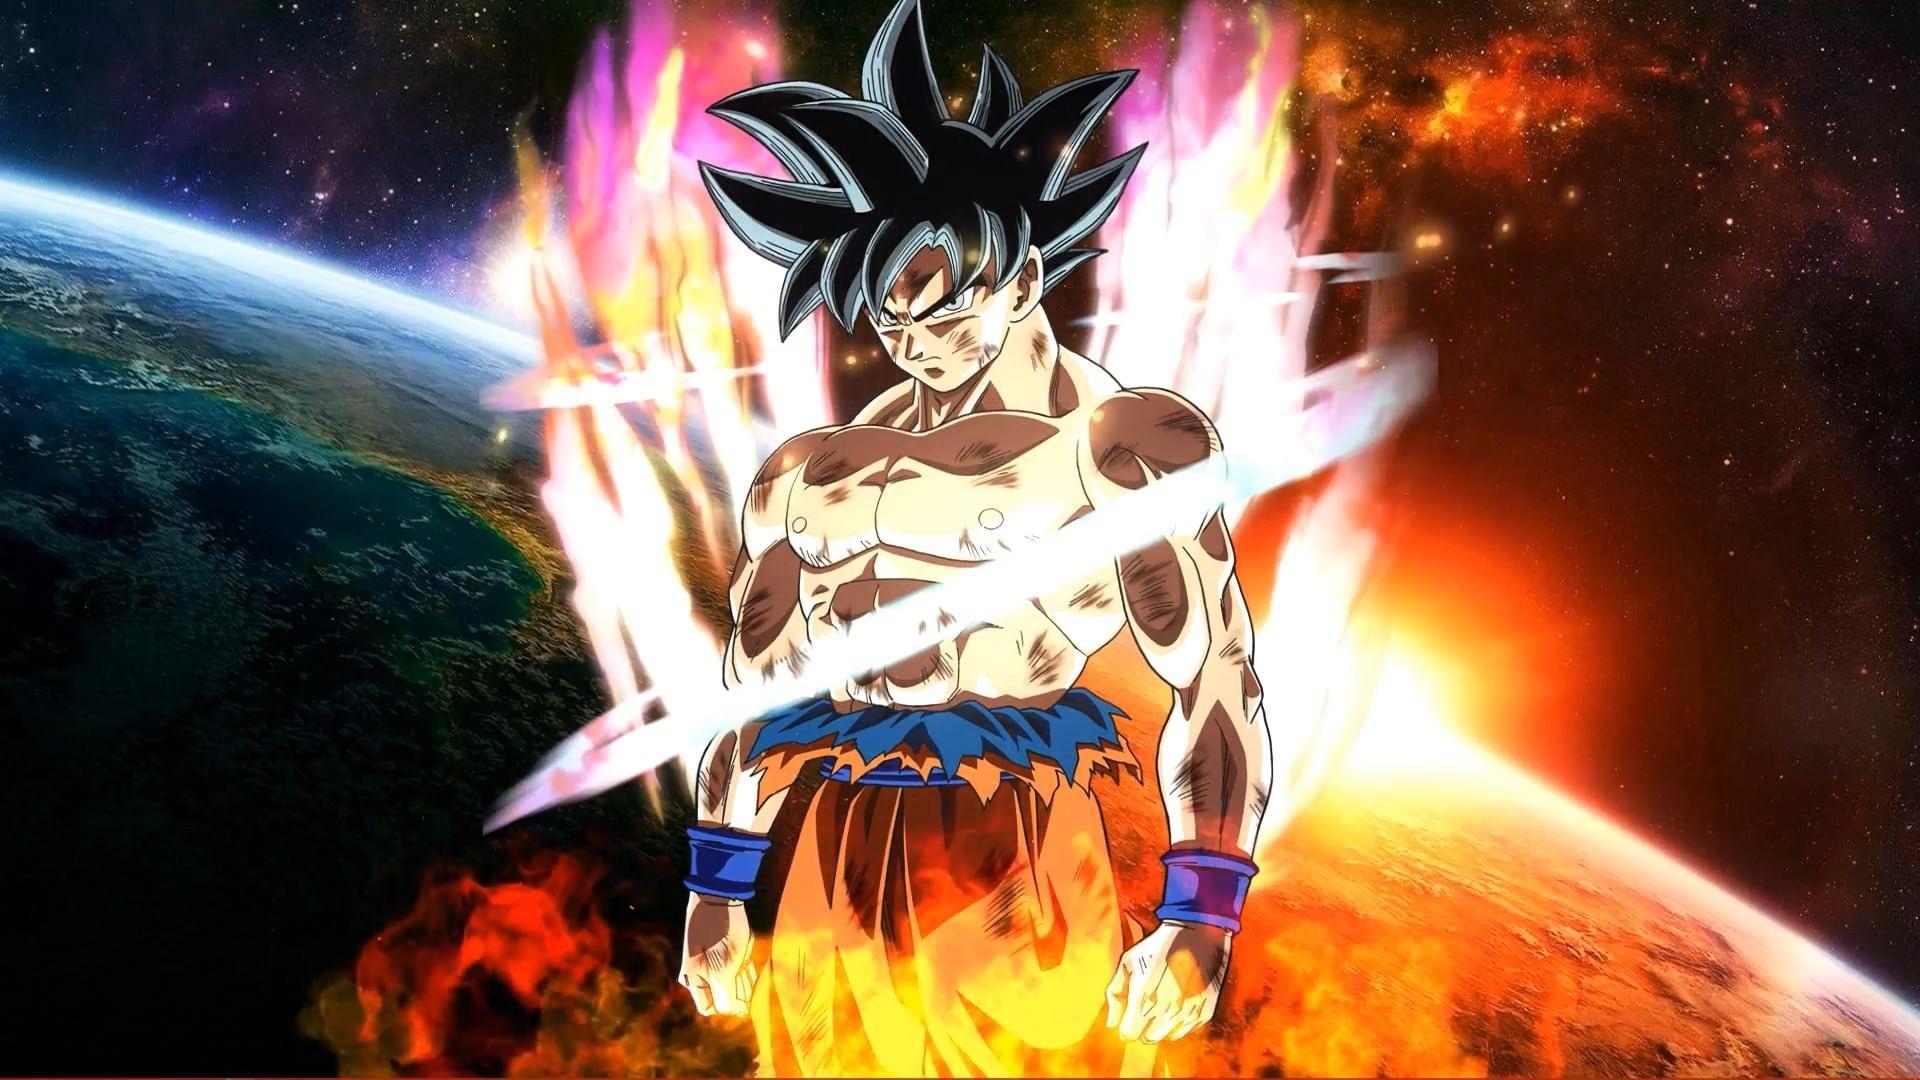 Goku Ultra Instinct windows background